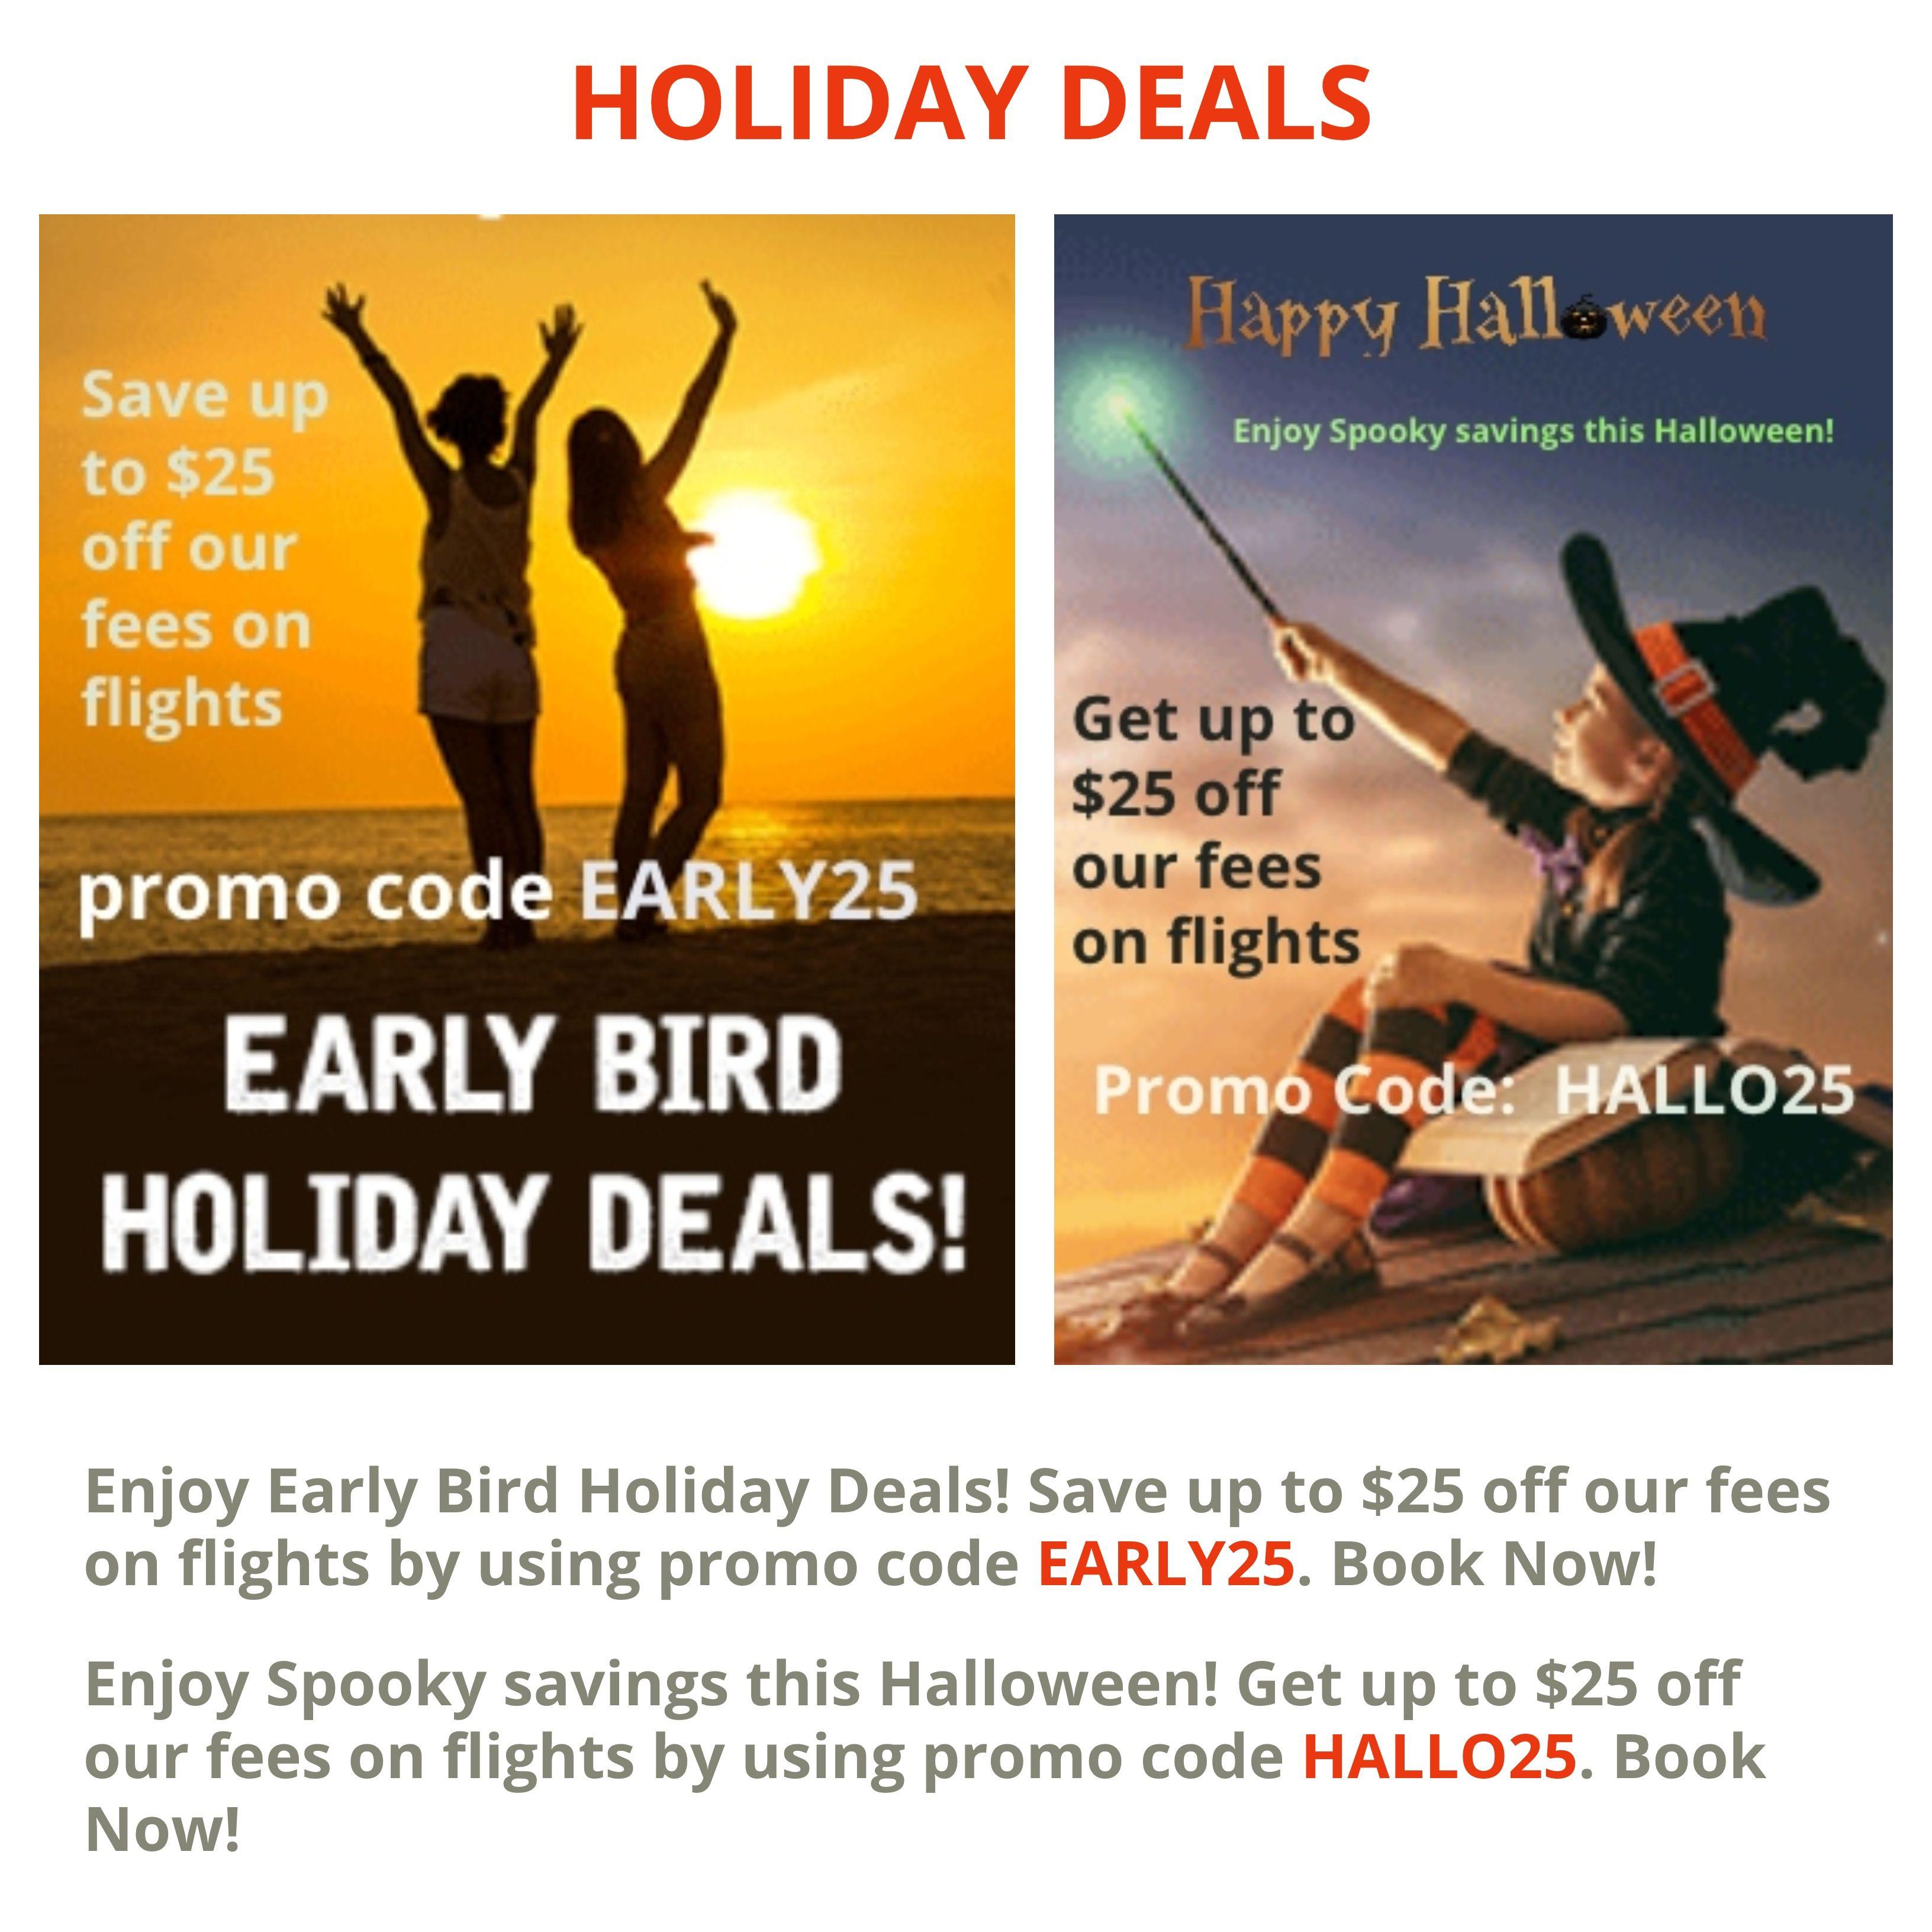 Halloween Holiday Deals Holiday Deals Halloween Travel Hotel Deals